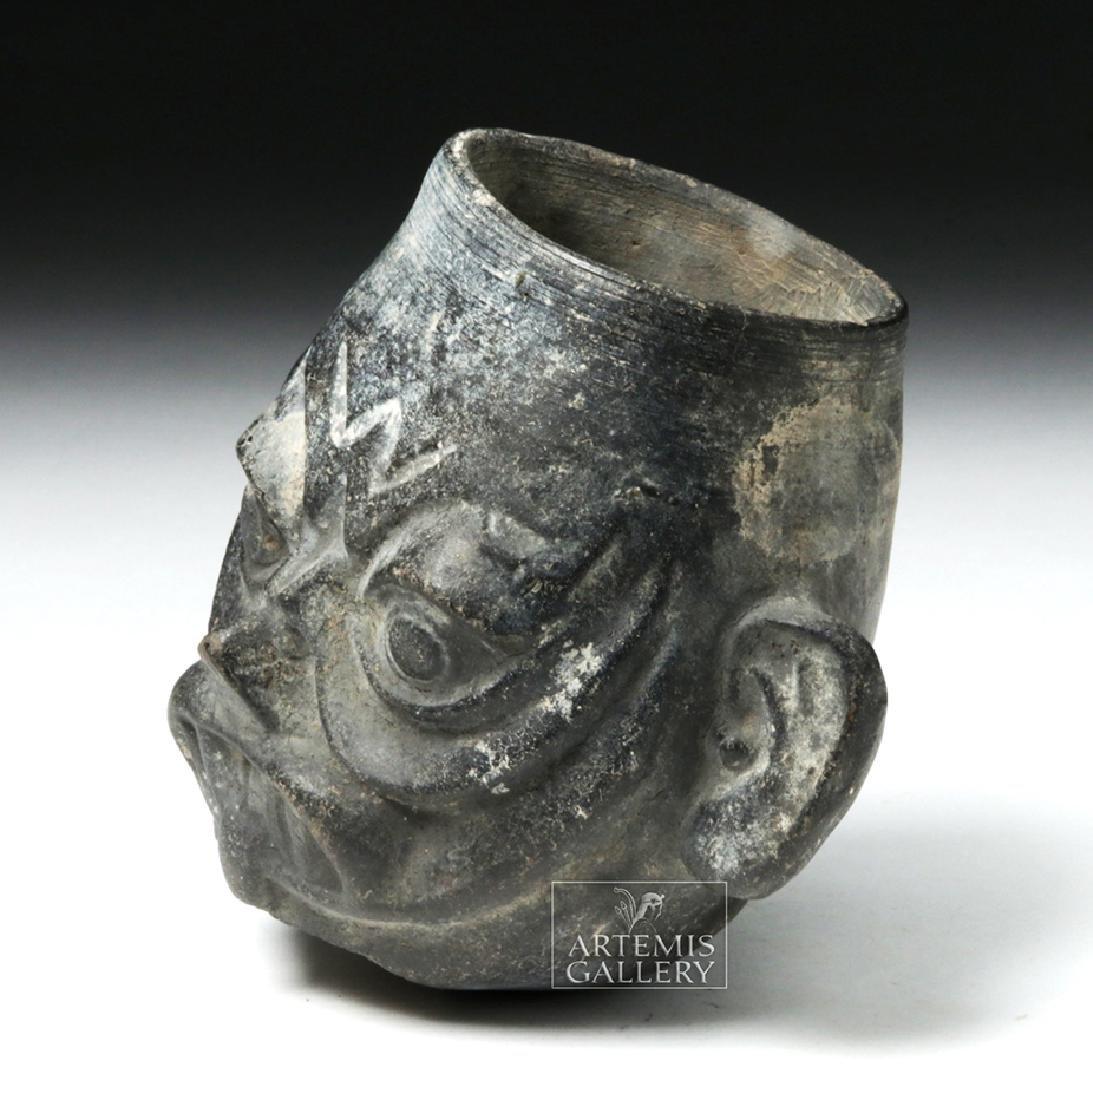 Moche Sican Pottery Blackware Cup - Ai Apec - 2